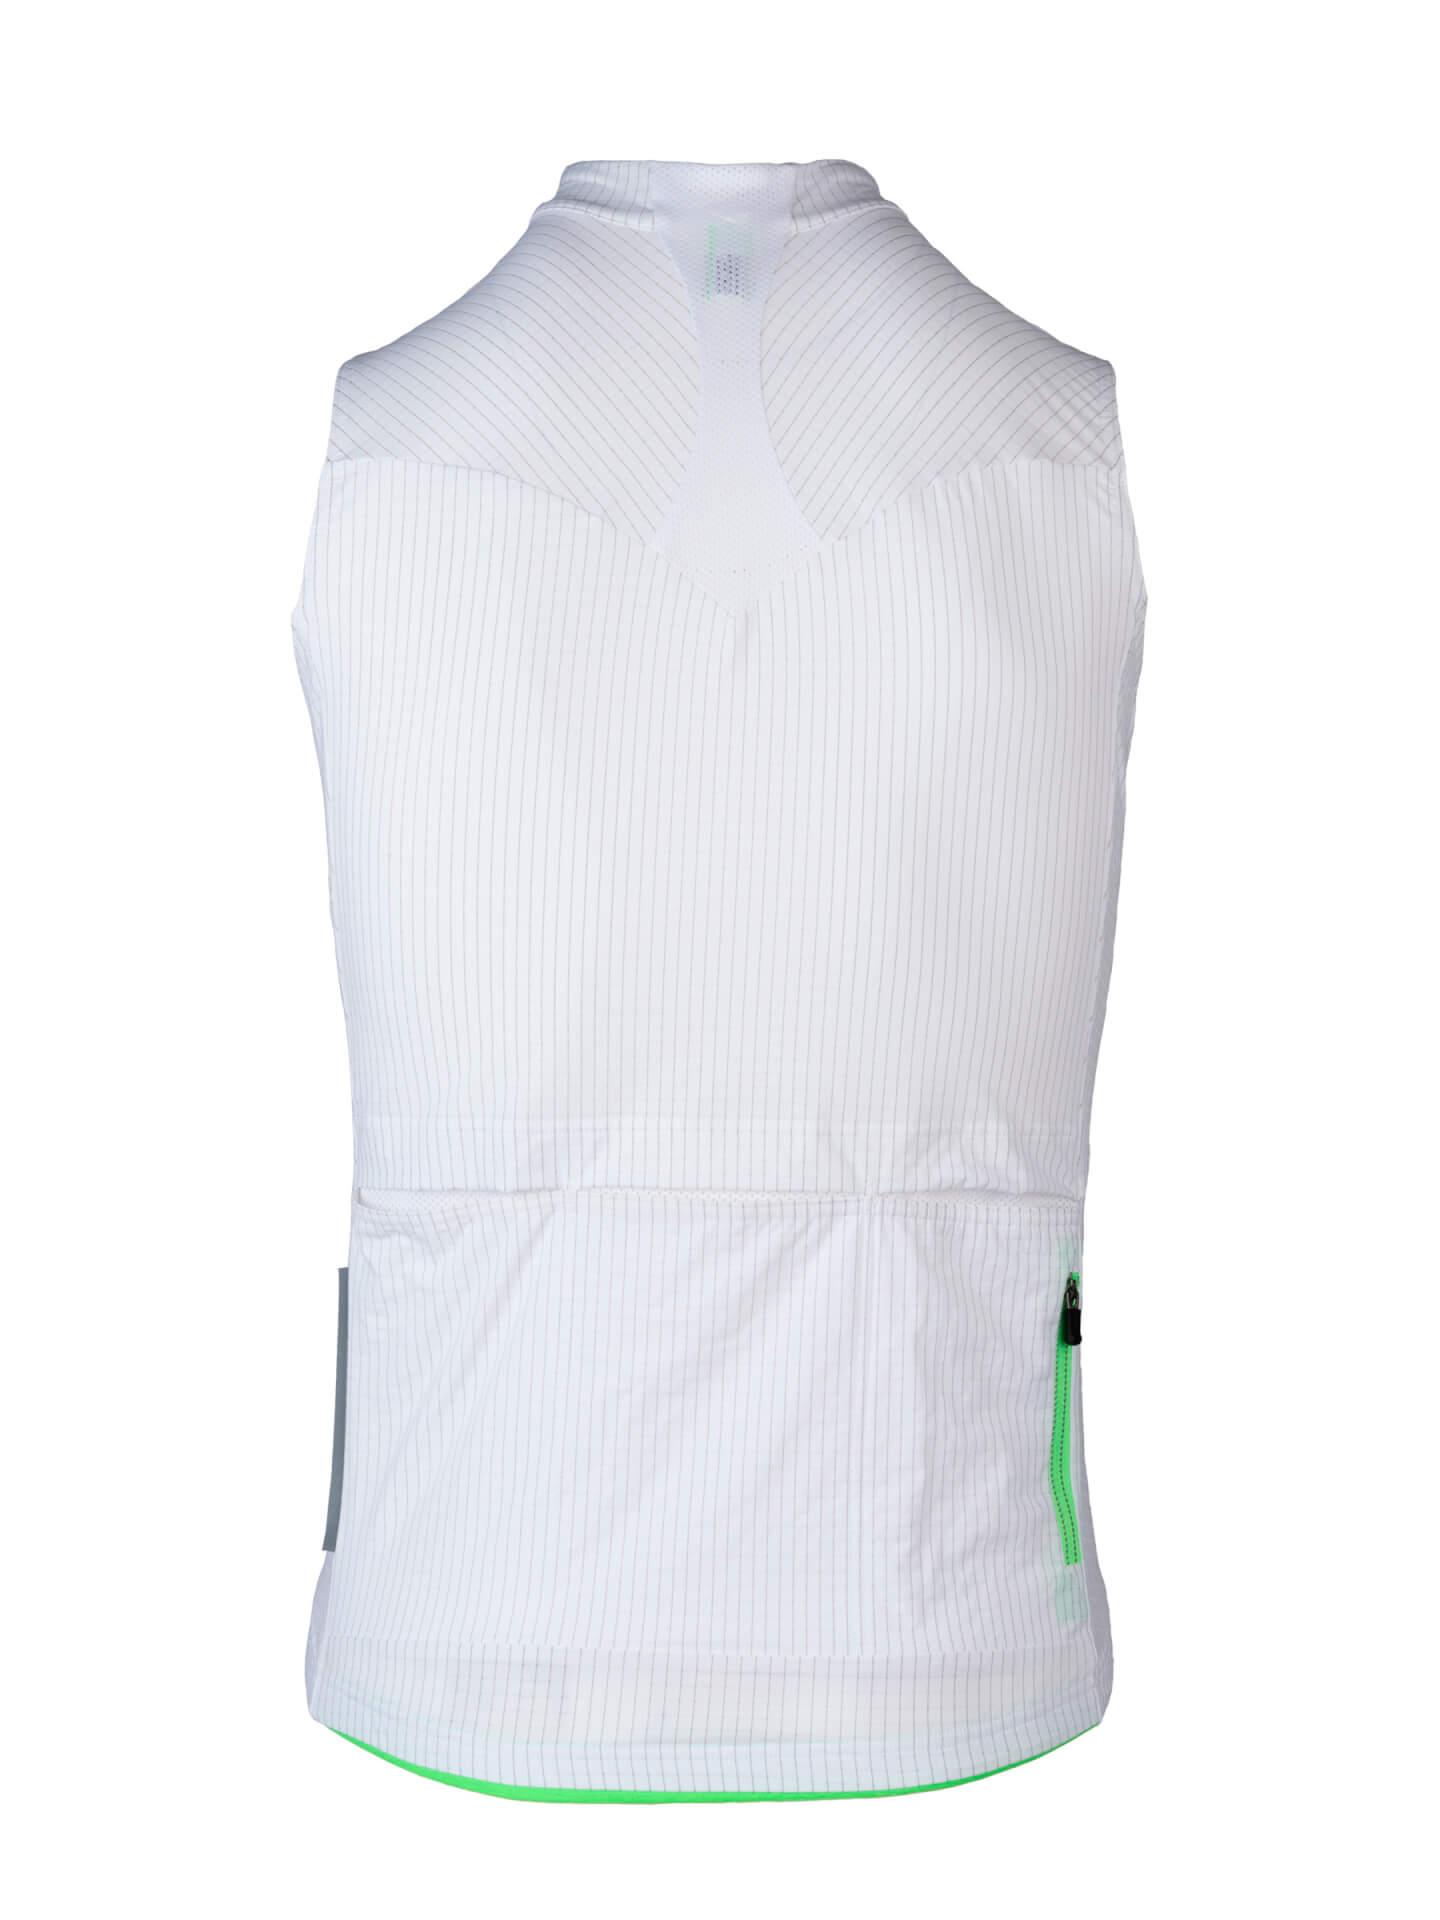 Jersey sleeveless L1 Pinstripe